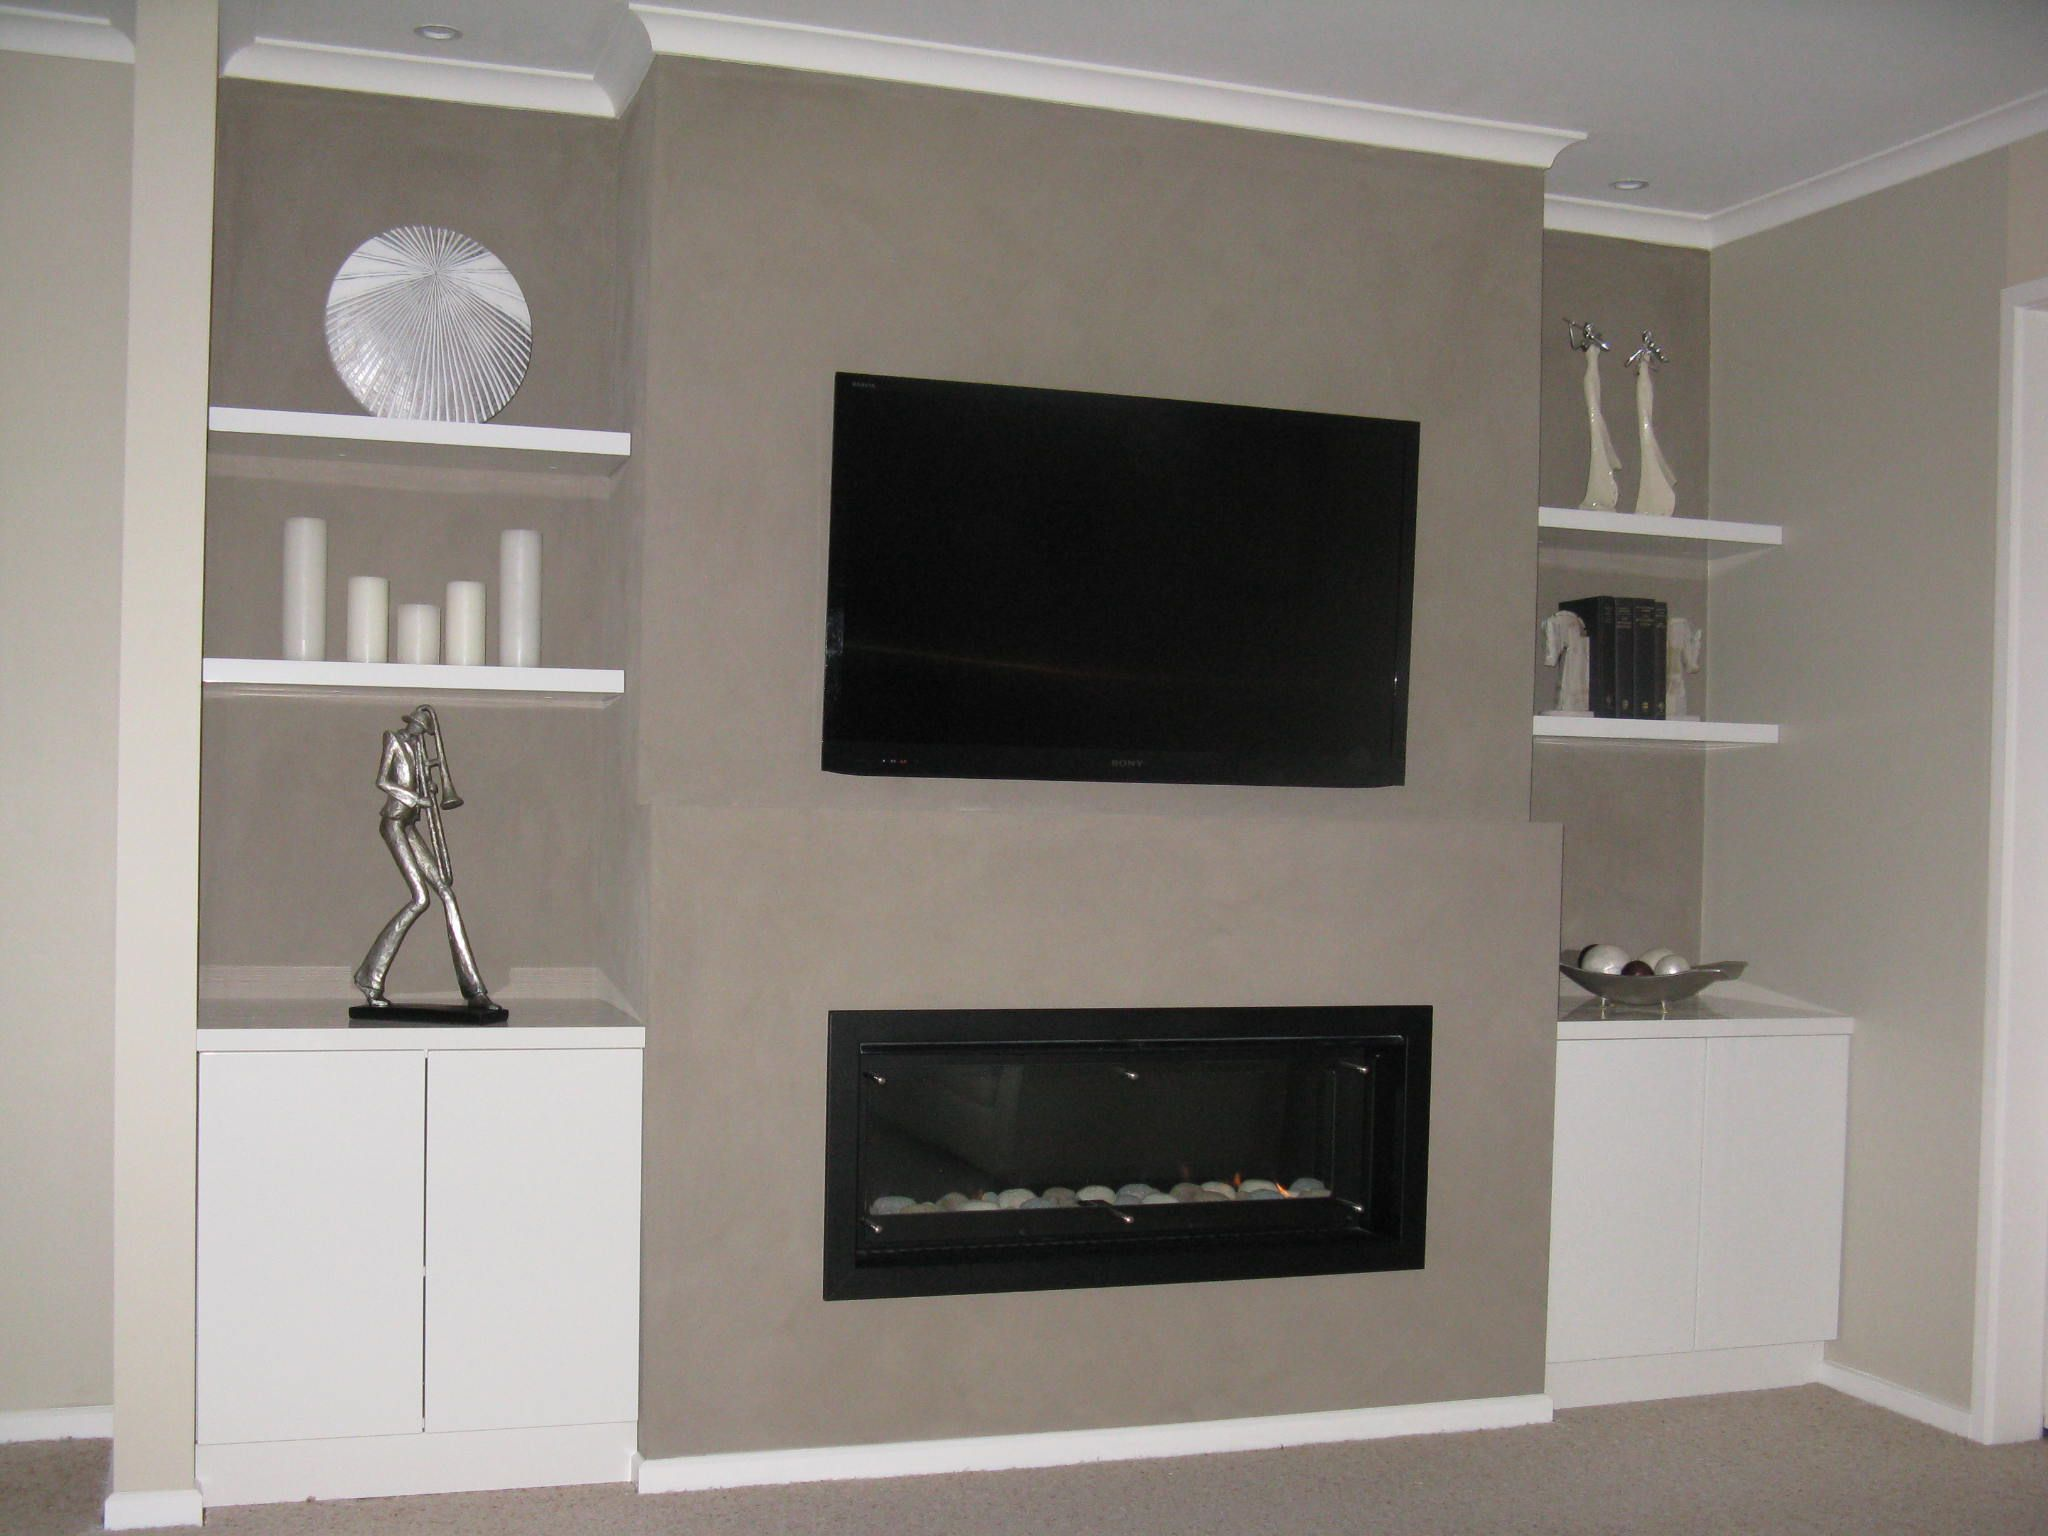 Fireplace With Tv Poisk V Google Tv Above Fireplace Home